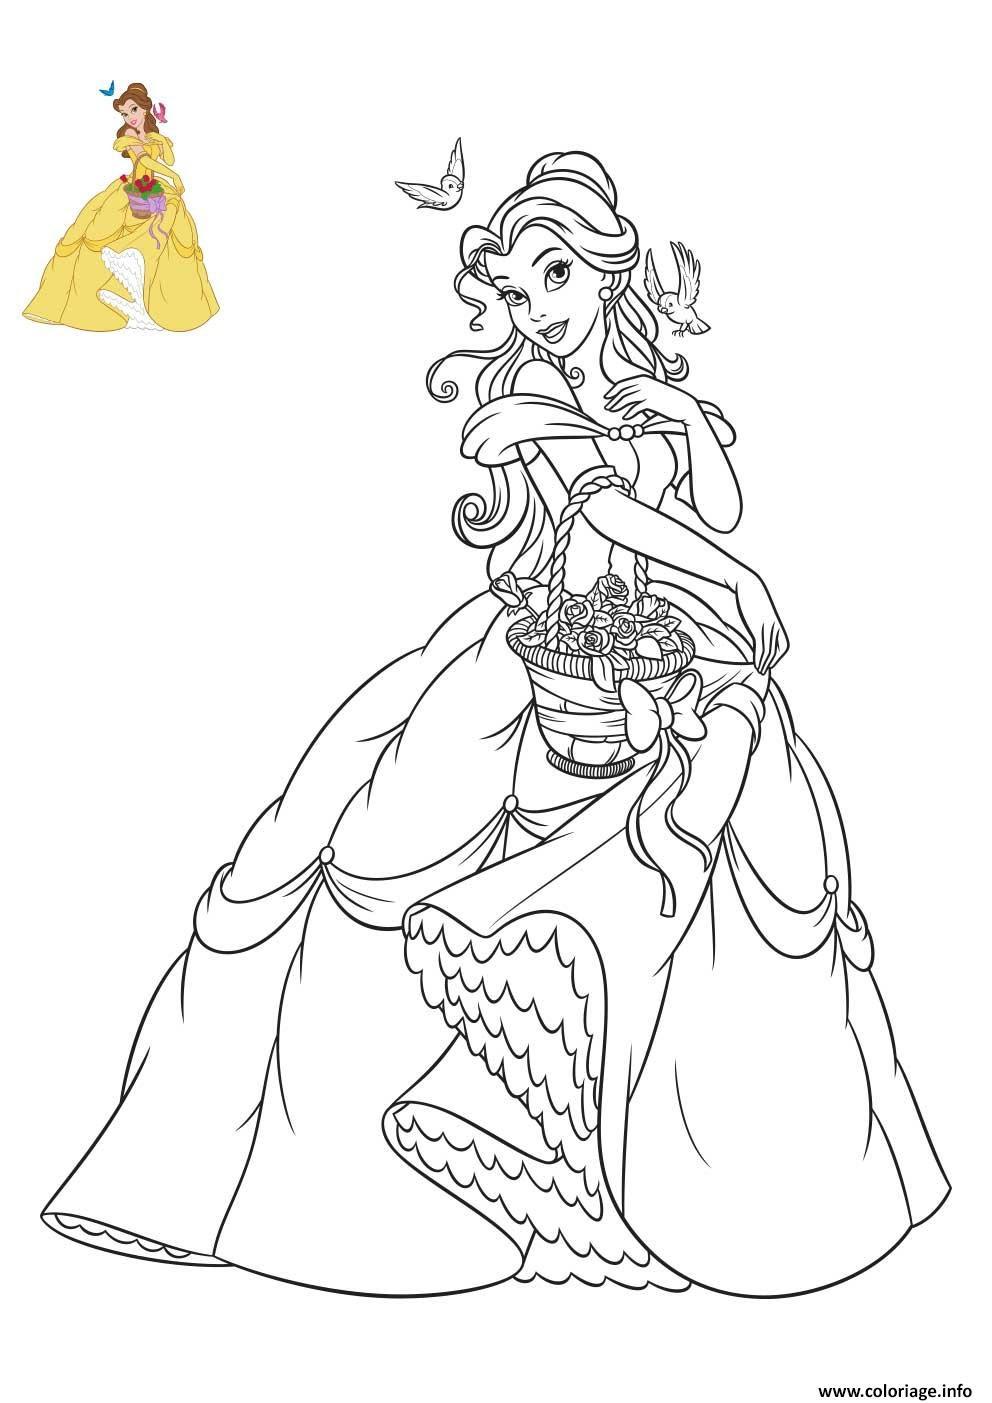 Coloriage Princesse Disney Belle Jecoloriecom